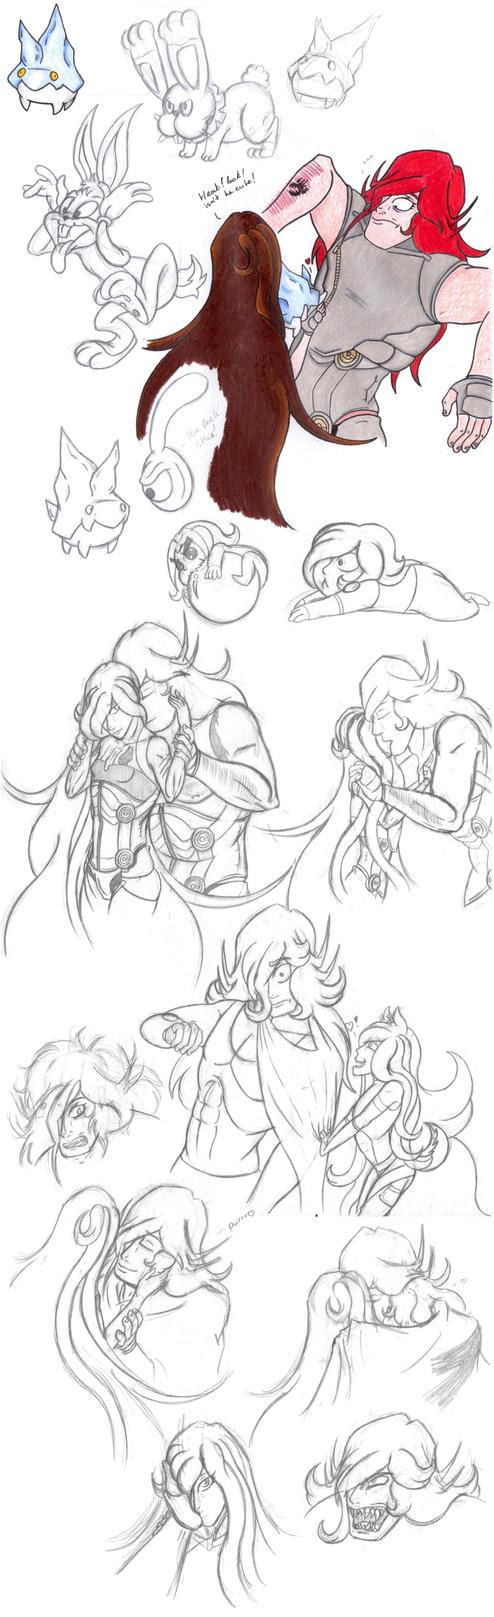 doodles by sparkyspawnoffire